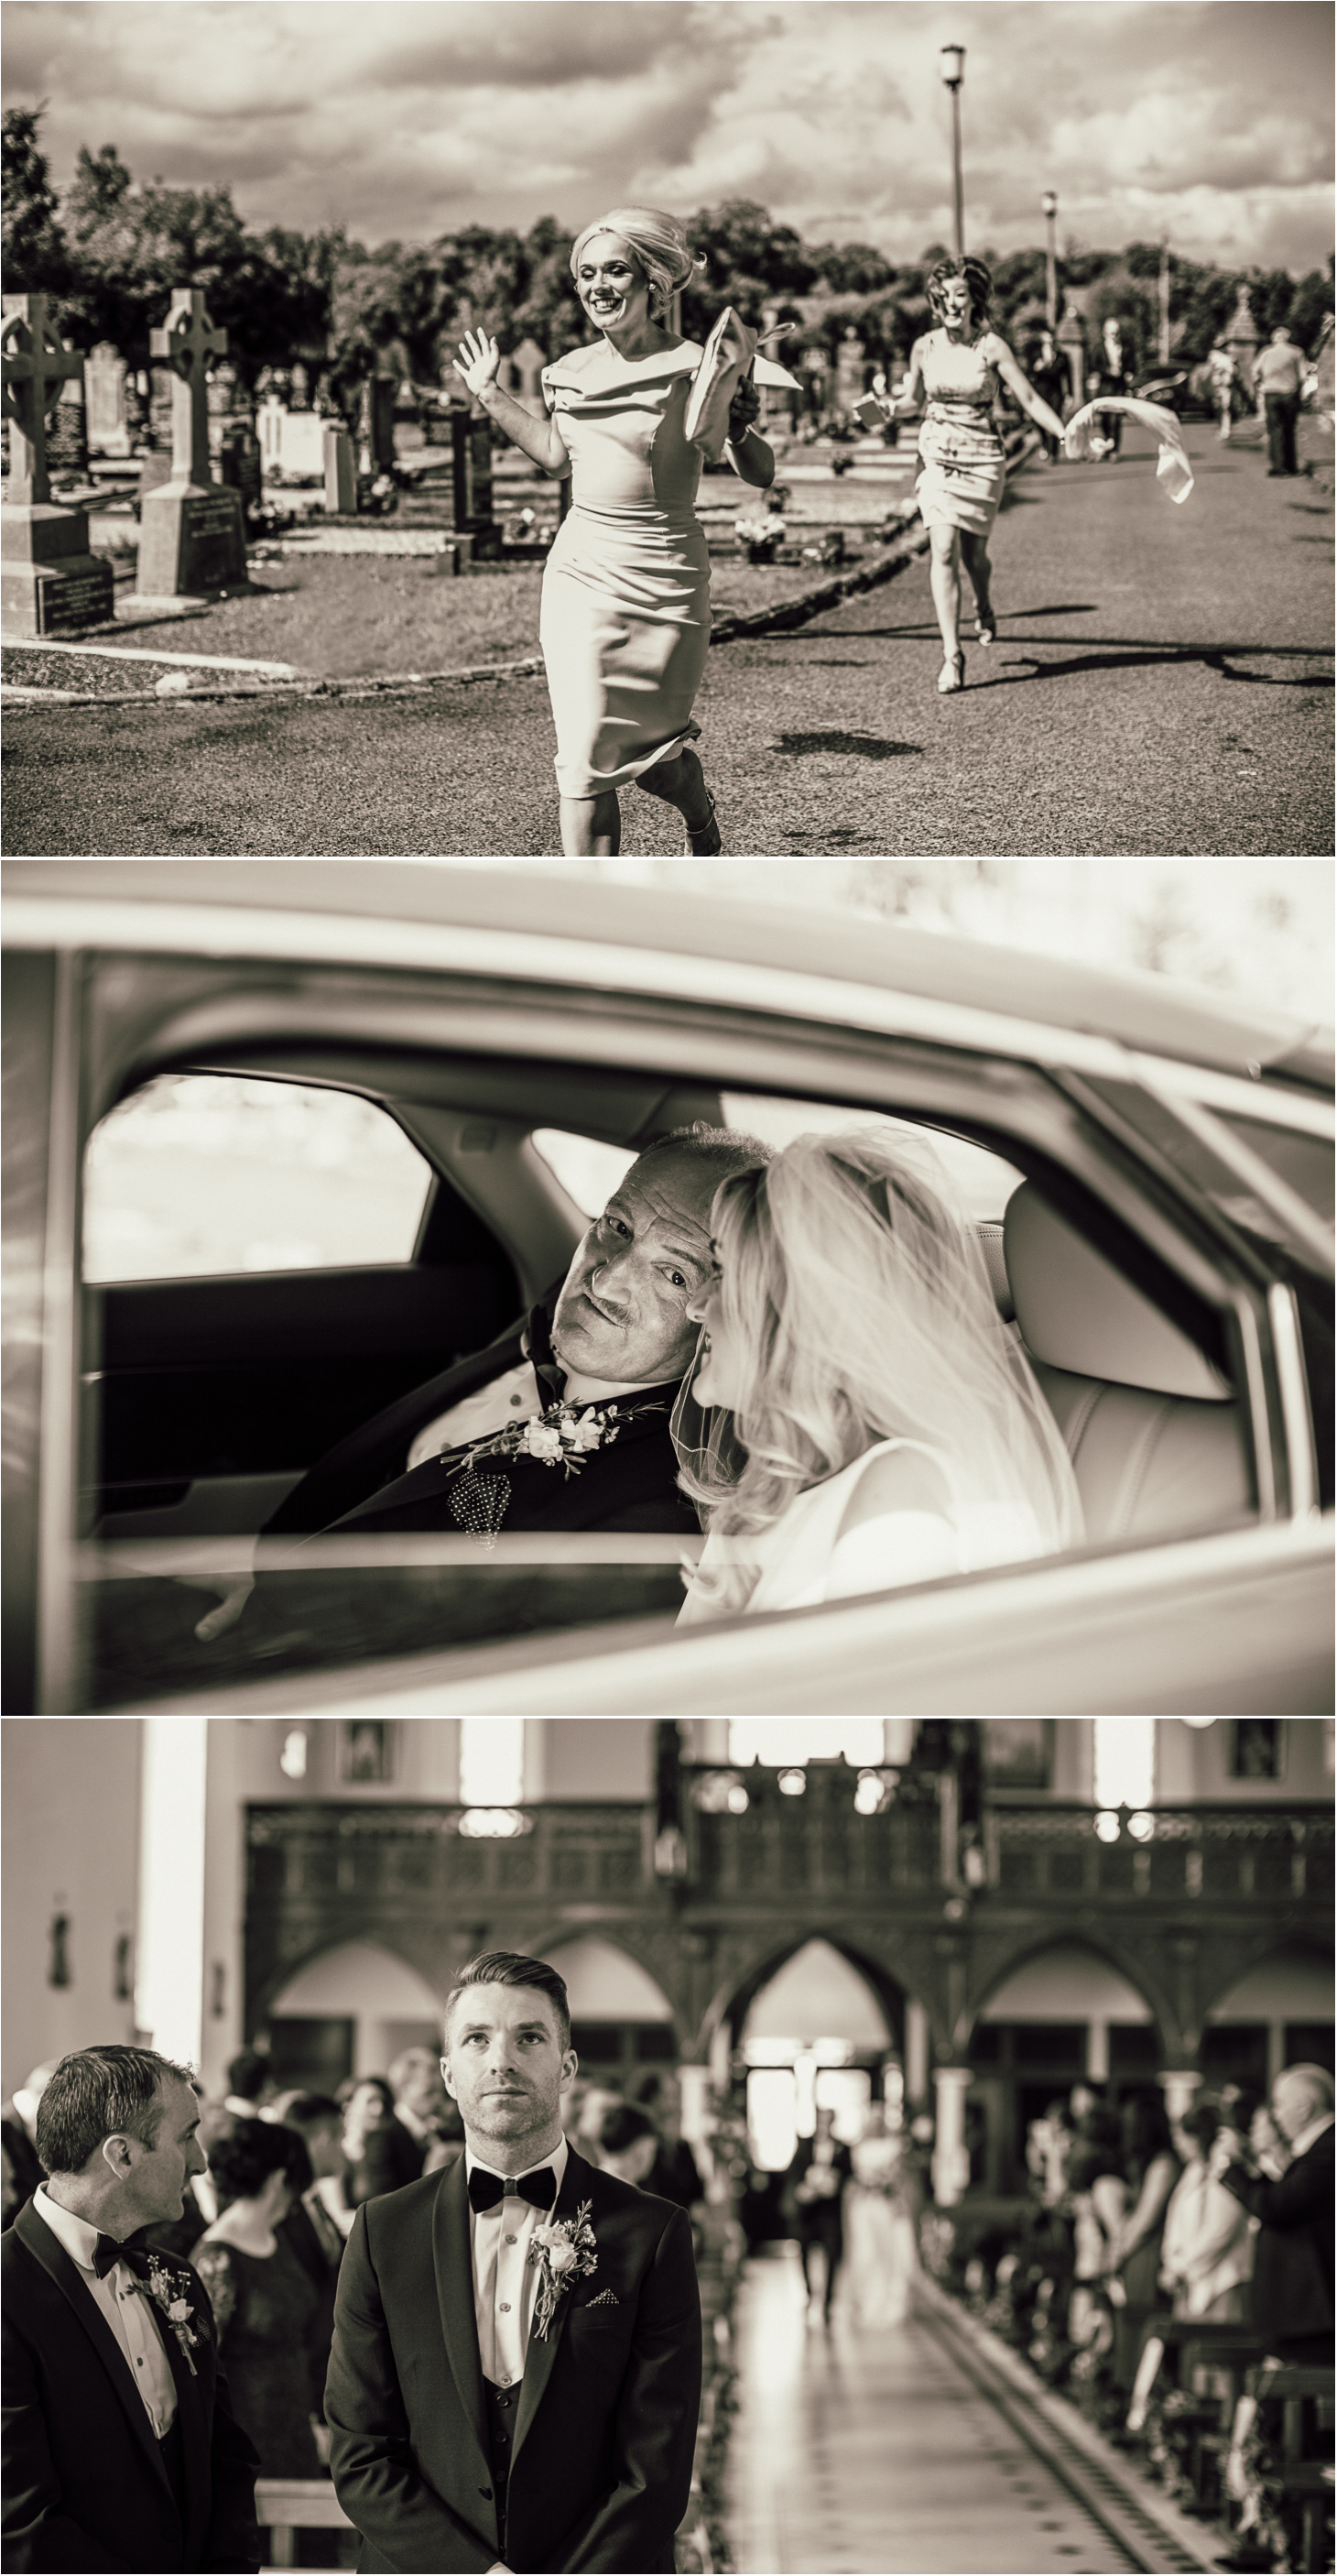 Virgina Lodge Photography. darren fitzpatrick. Wedding.7